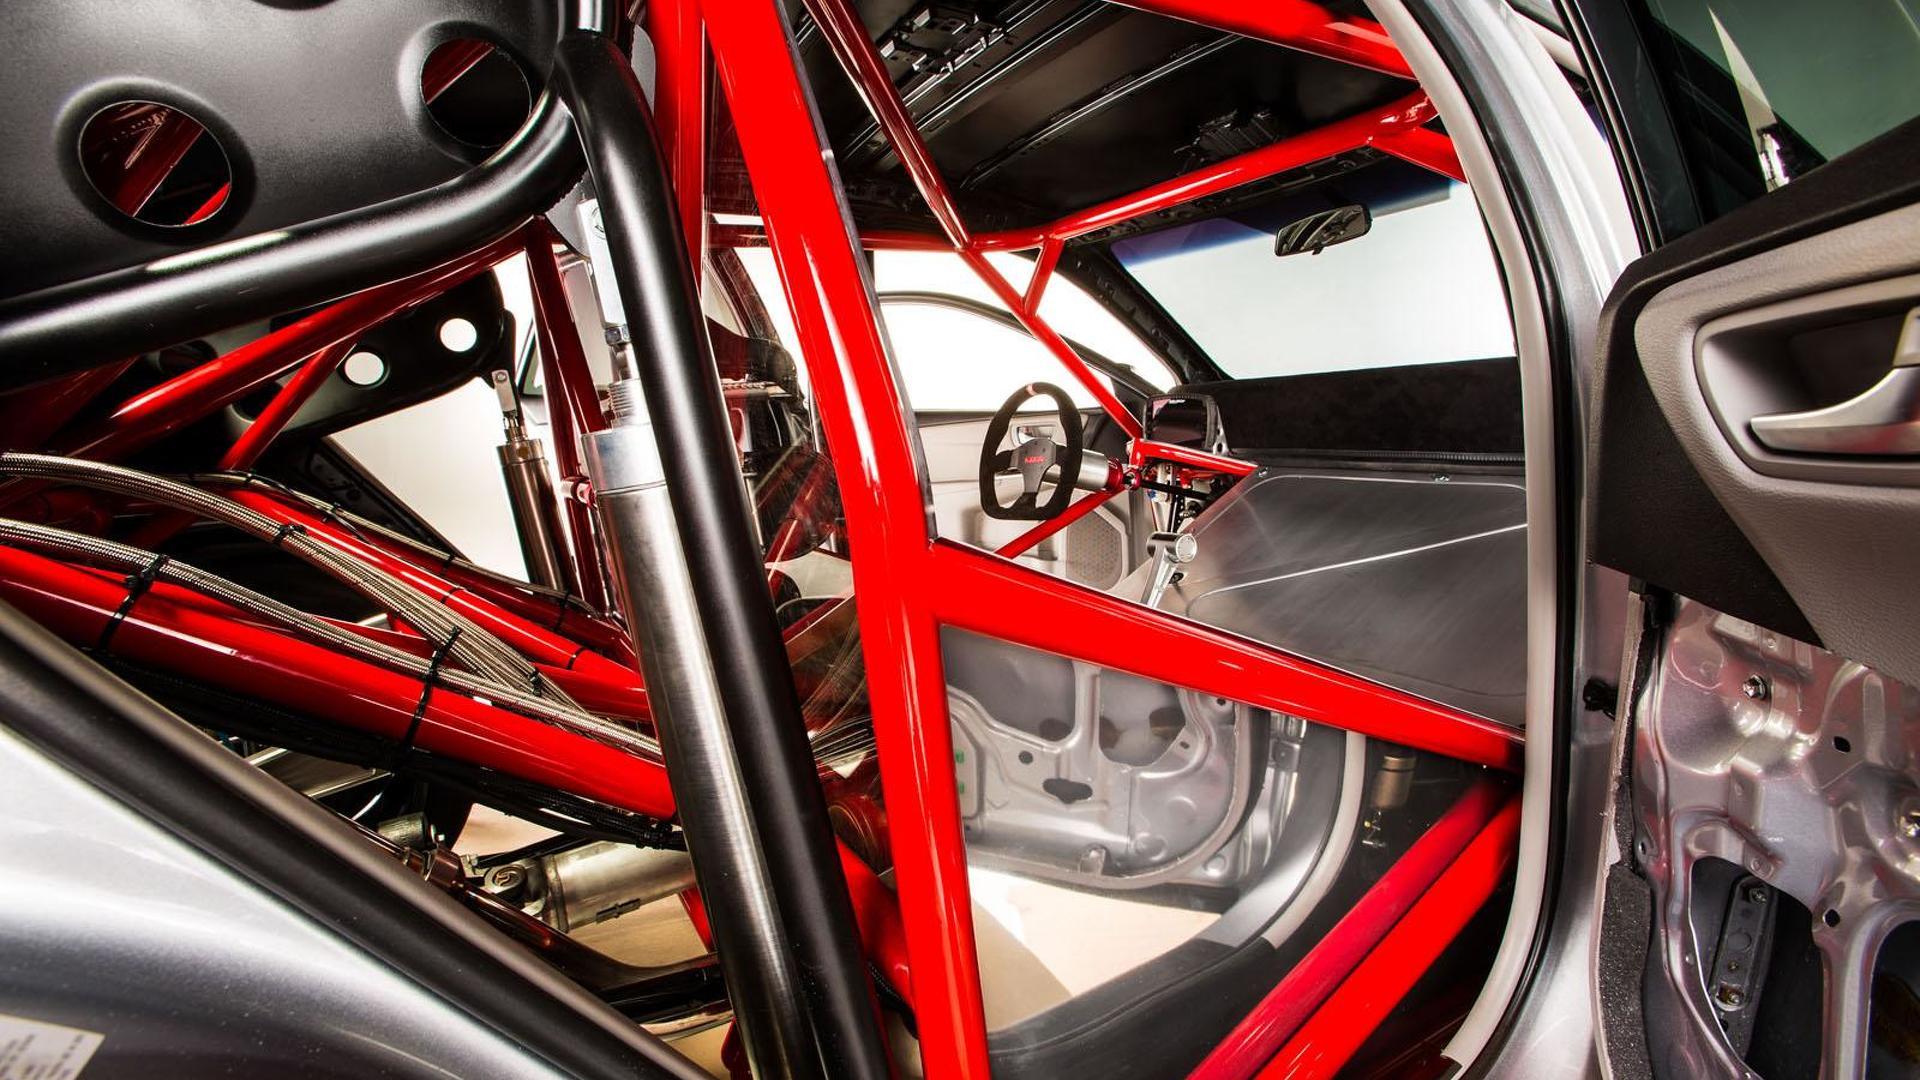 Toyota introduces an 850+ bhp Camry Sleeper at SEMA